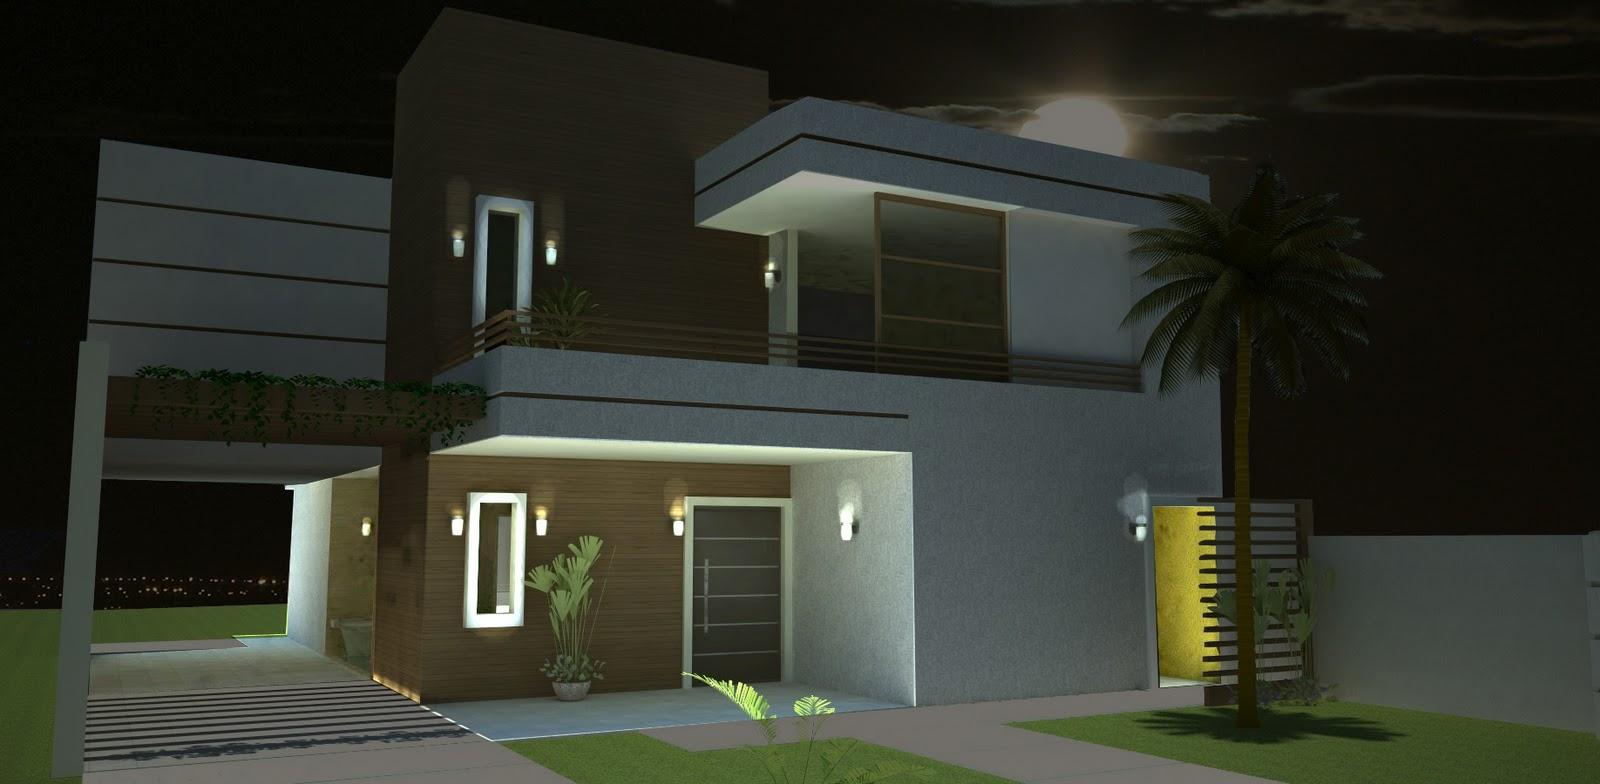 Fotos de patios casas modernas presupuesto e imagenes for Casas modernas